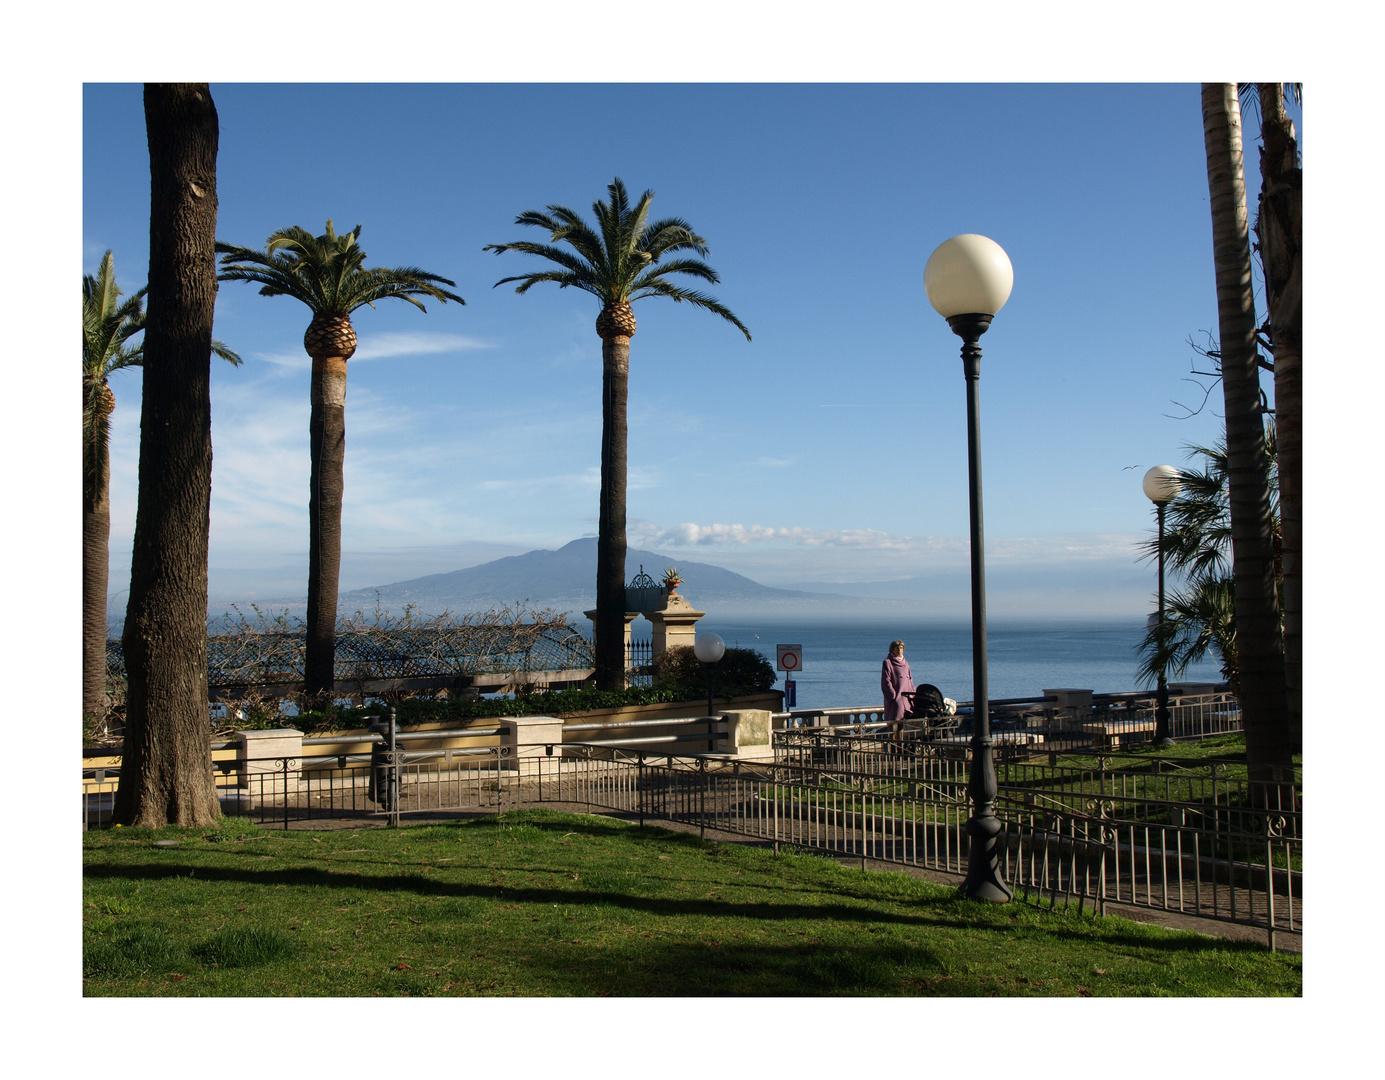 Sorrent mit Blick auf den Vesuv